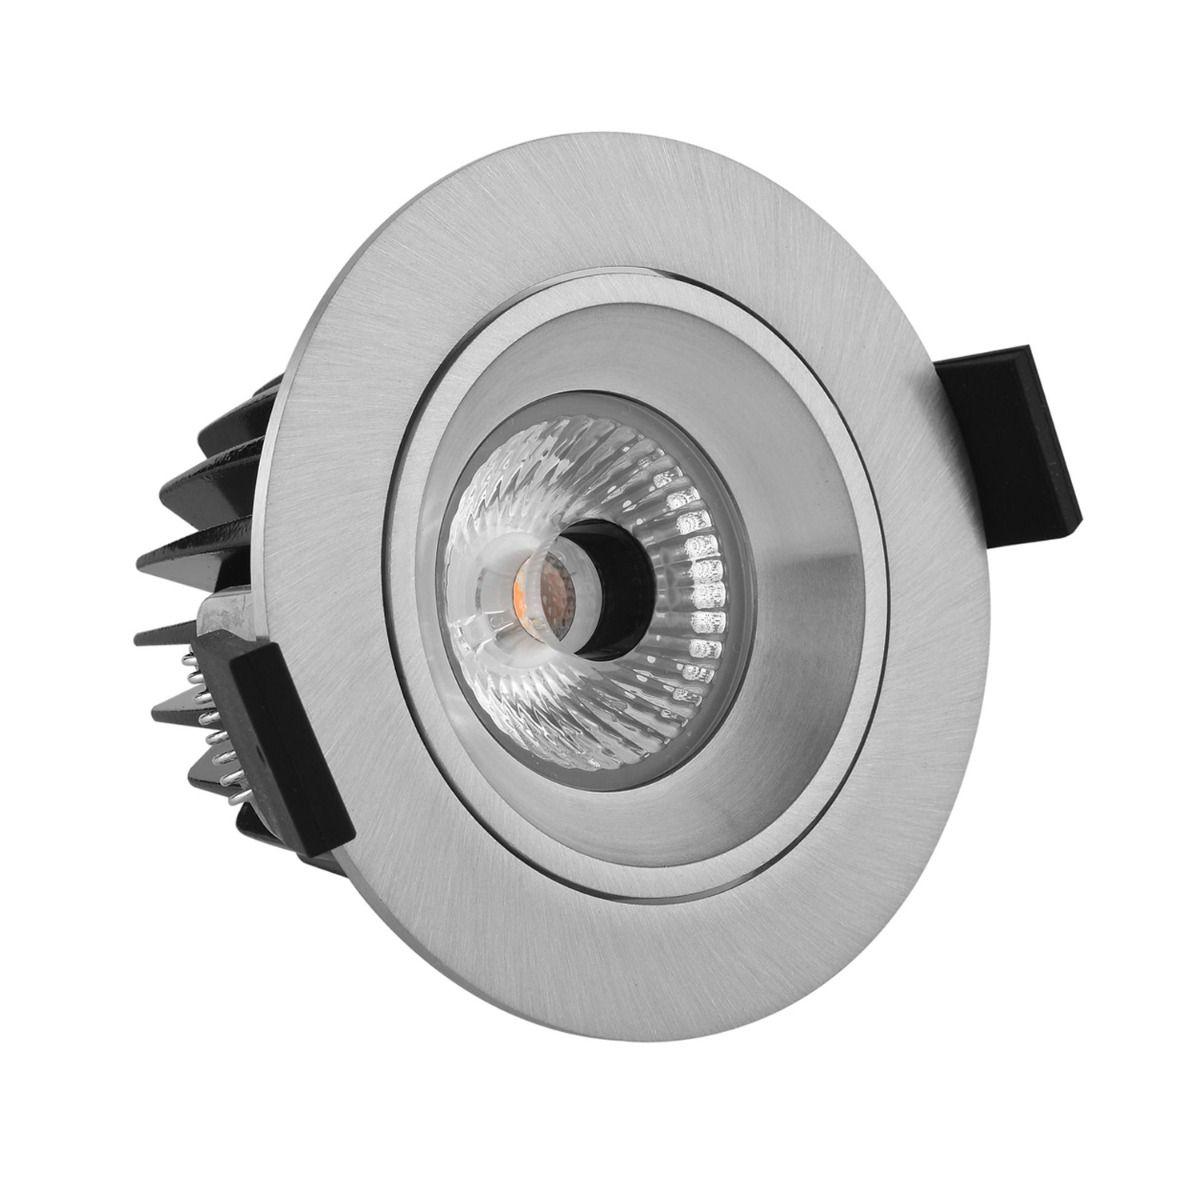 Noxion LED-Spot Diamond IP44 2700K Aluminium   Höchste Farbwiedergabe - Dimmbar